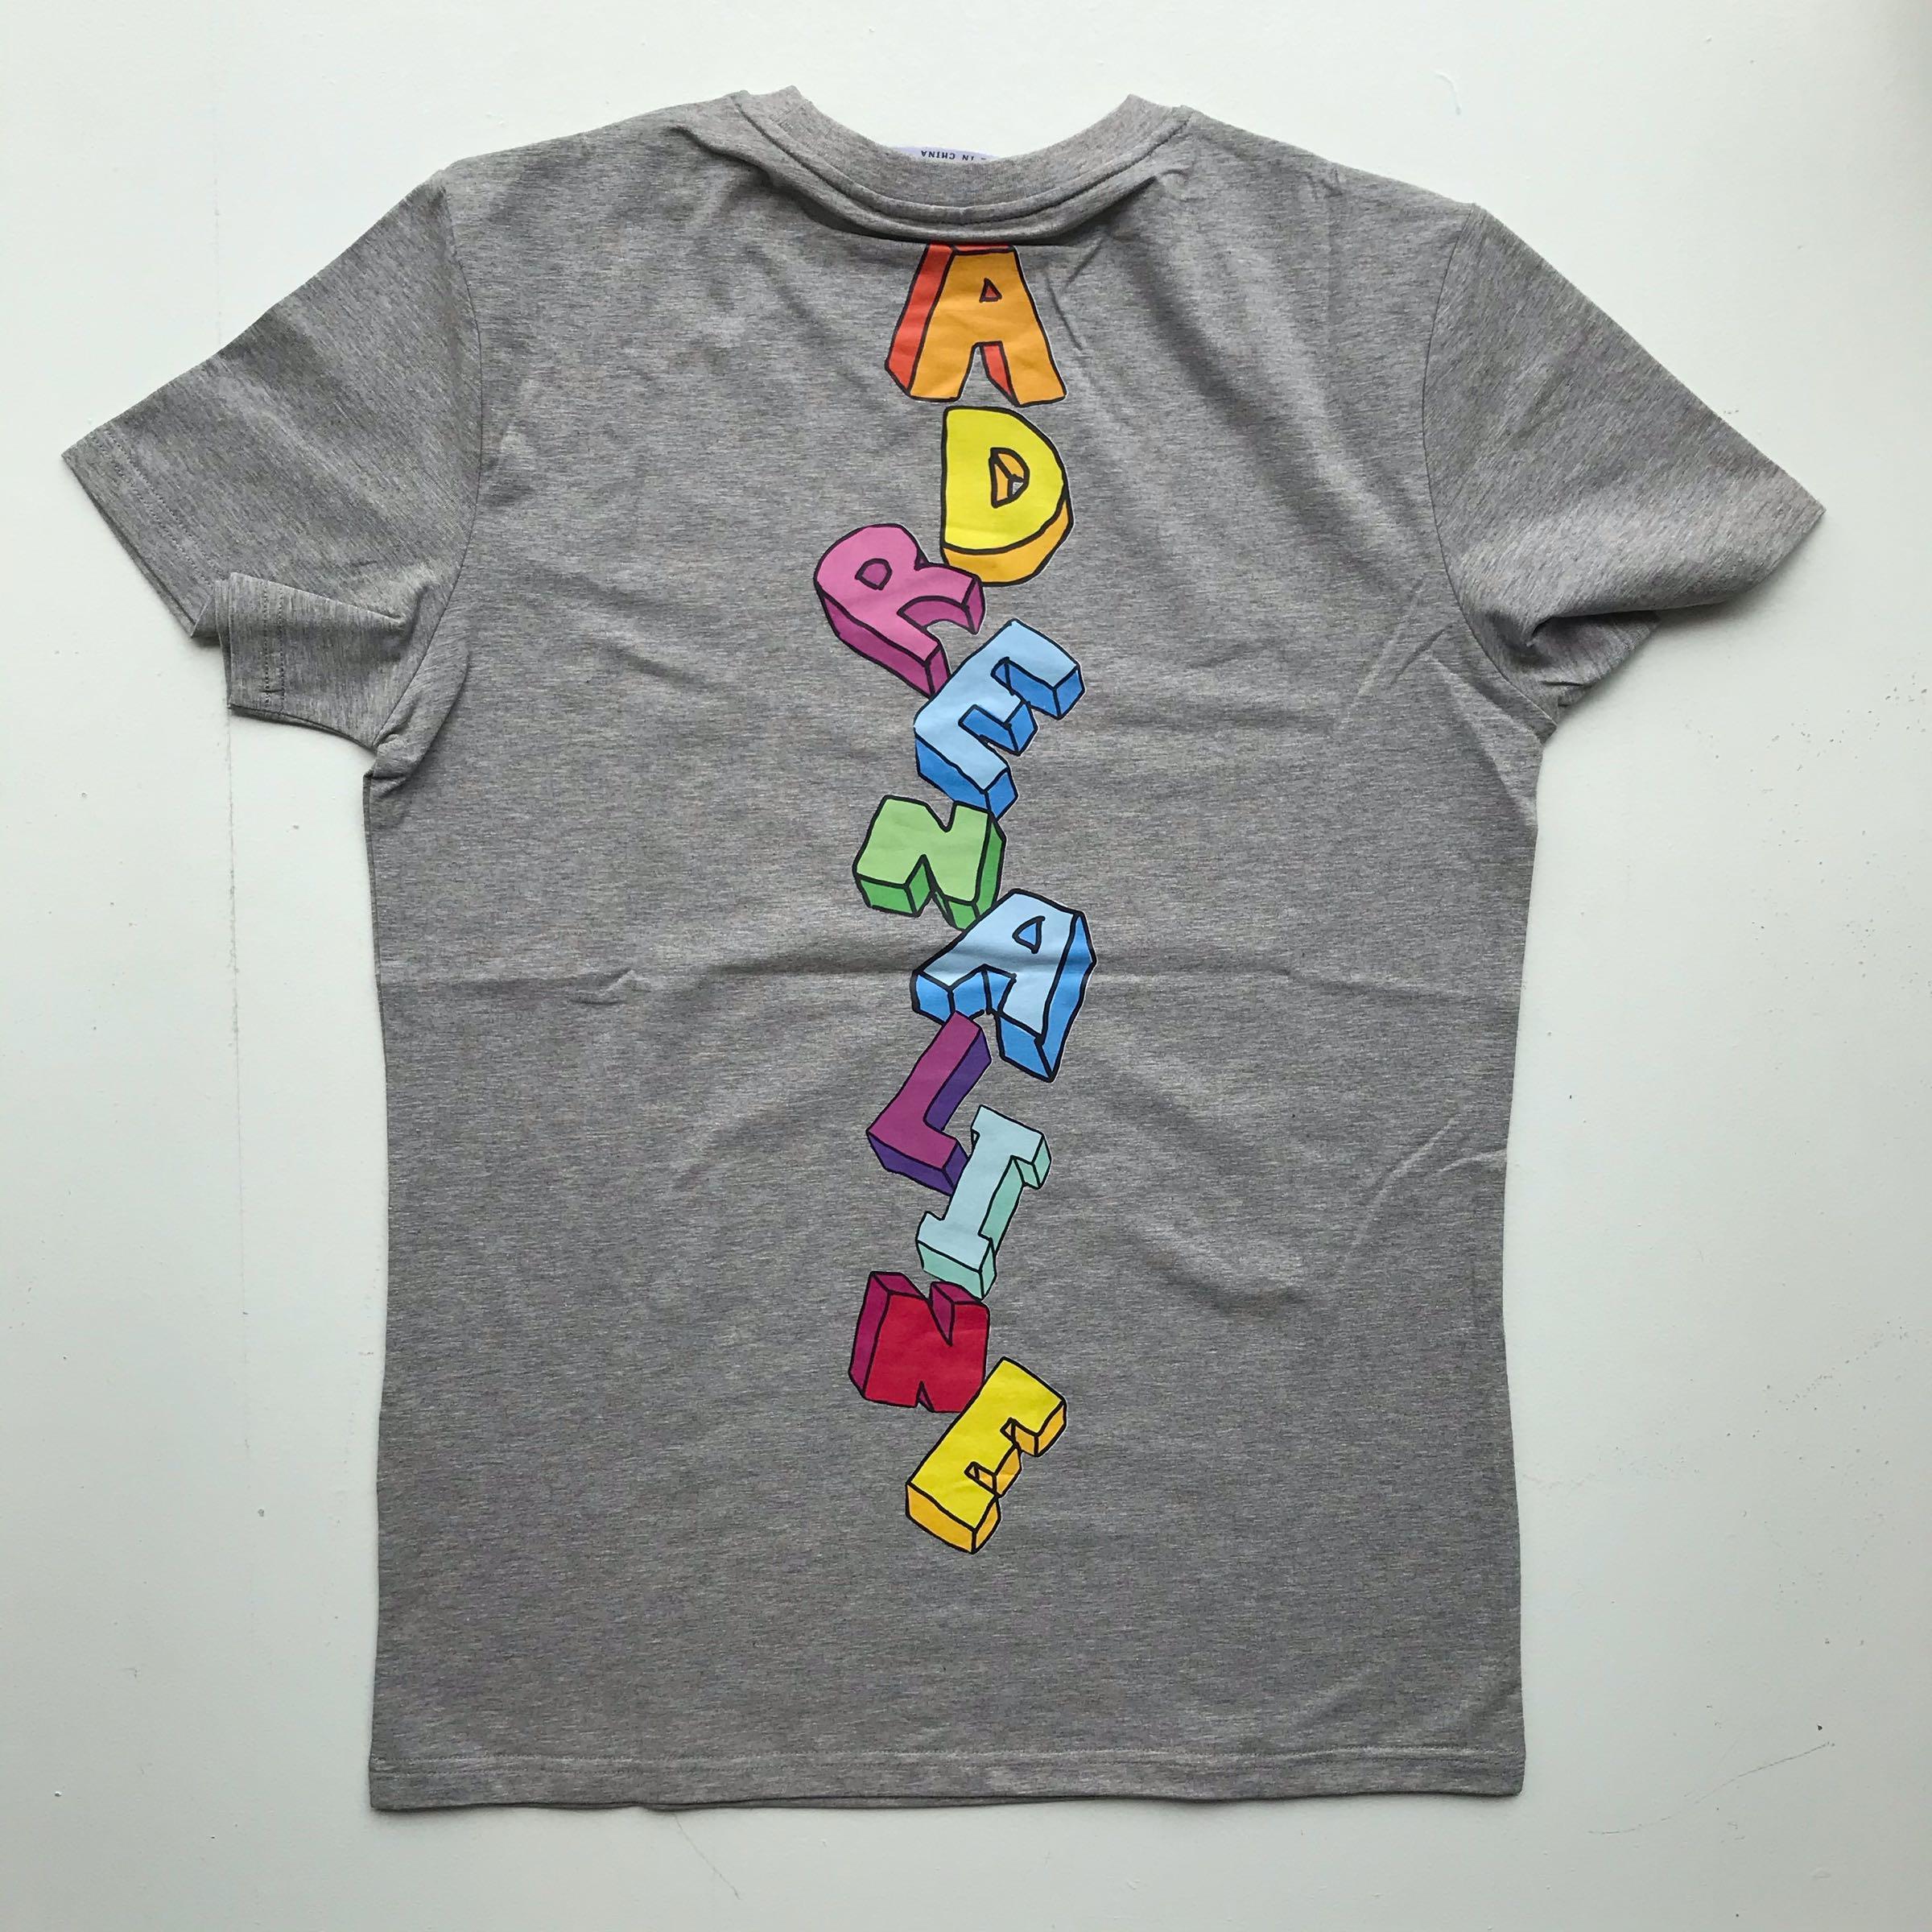 Adrenaline T-skjorte